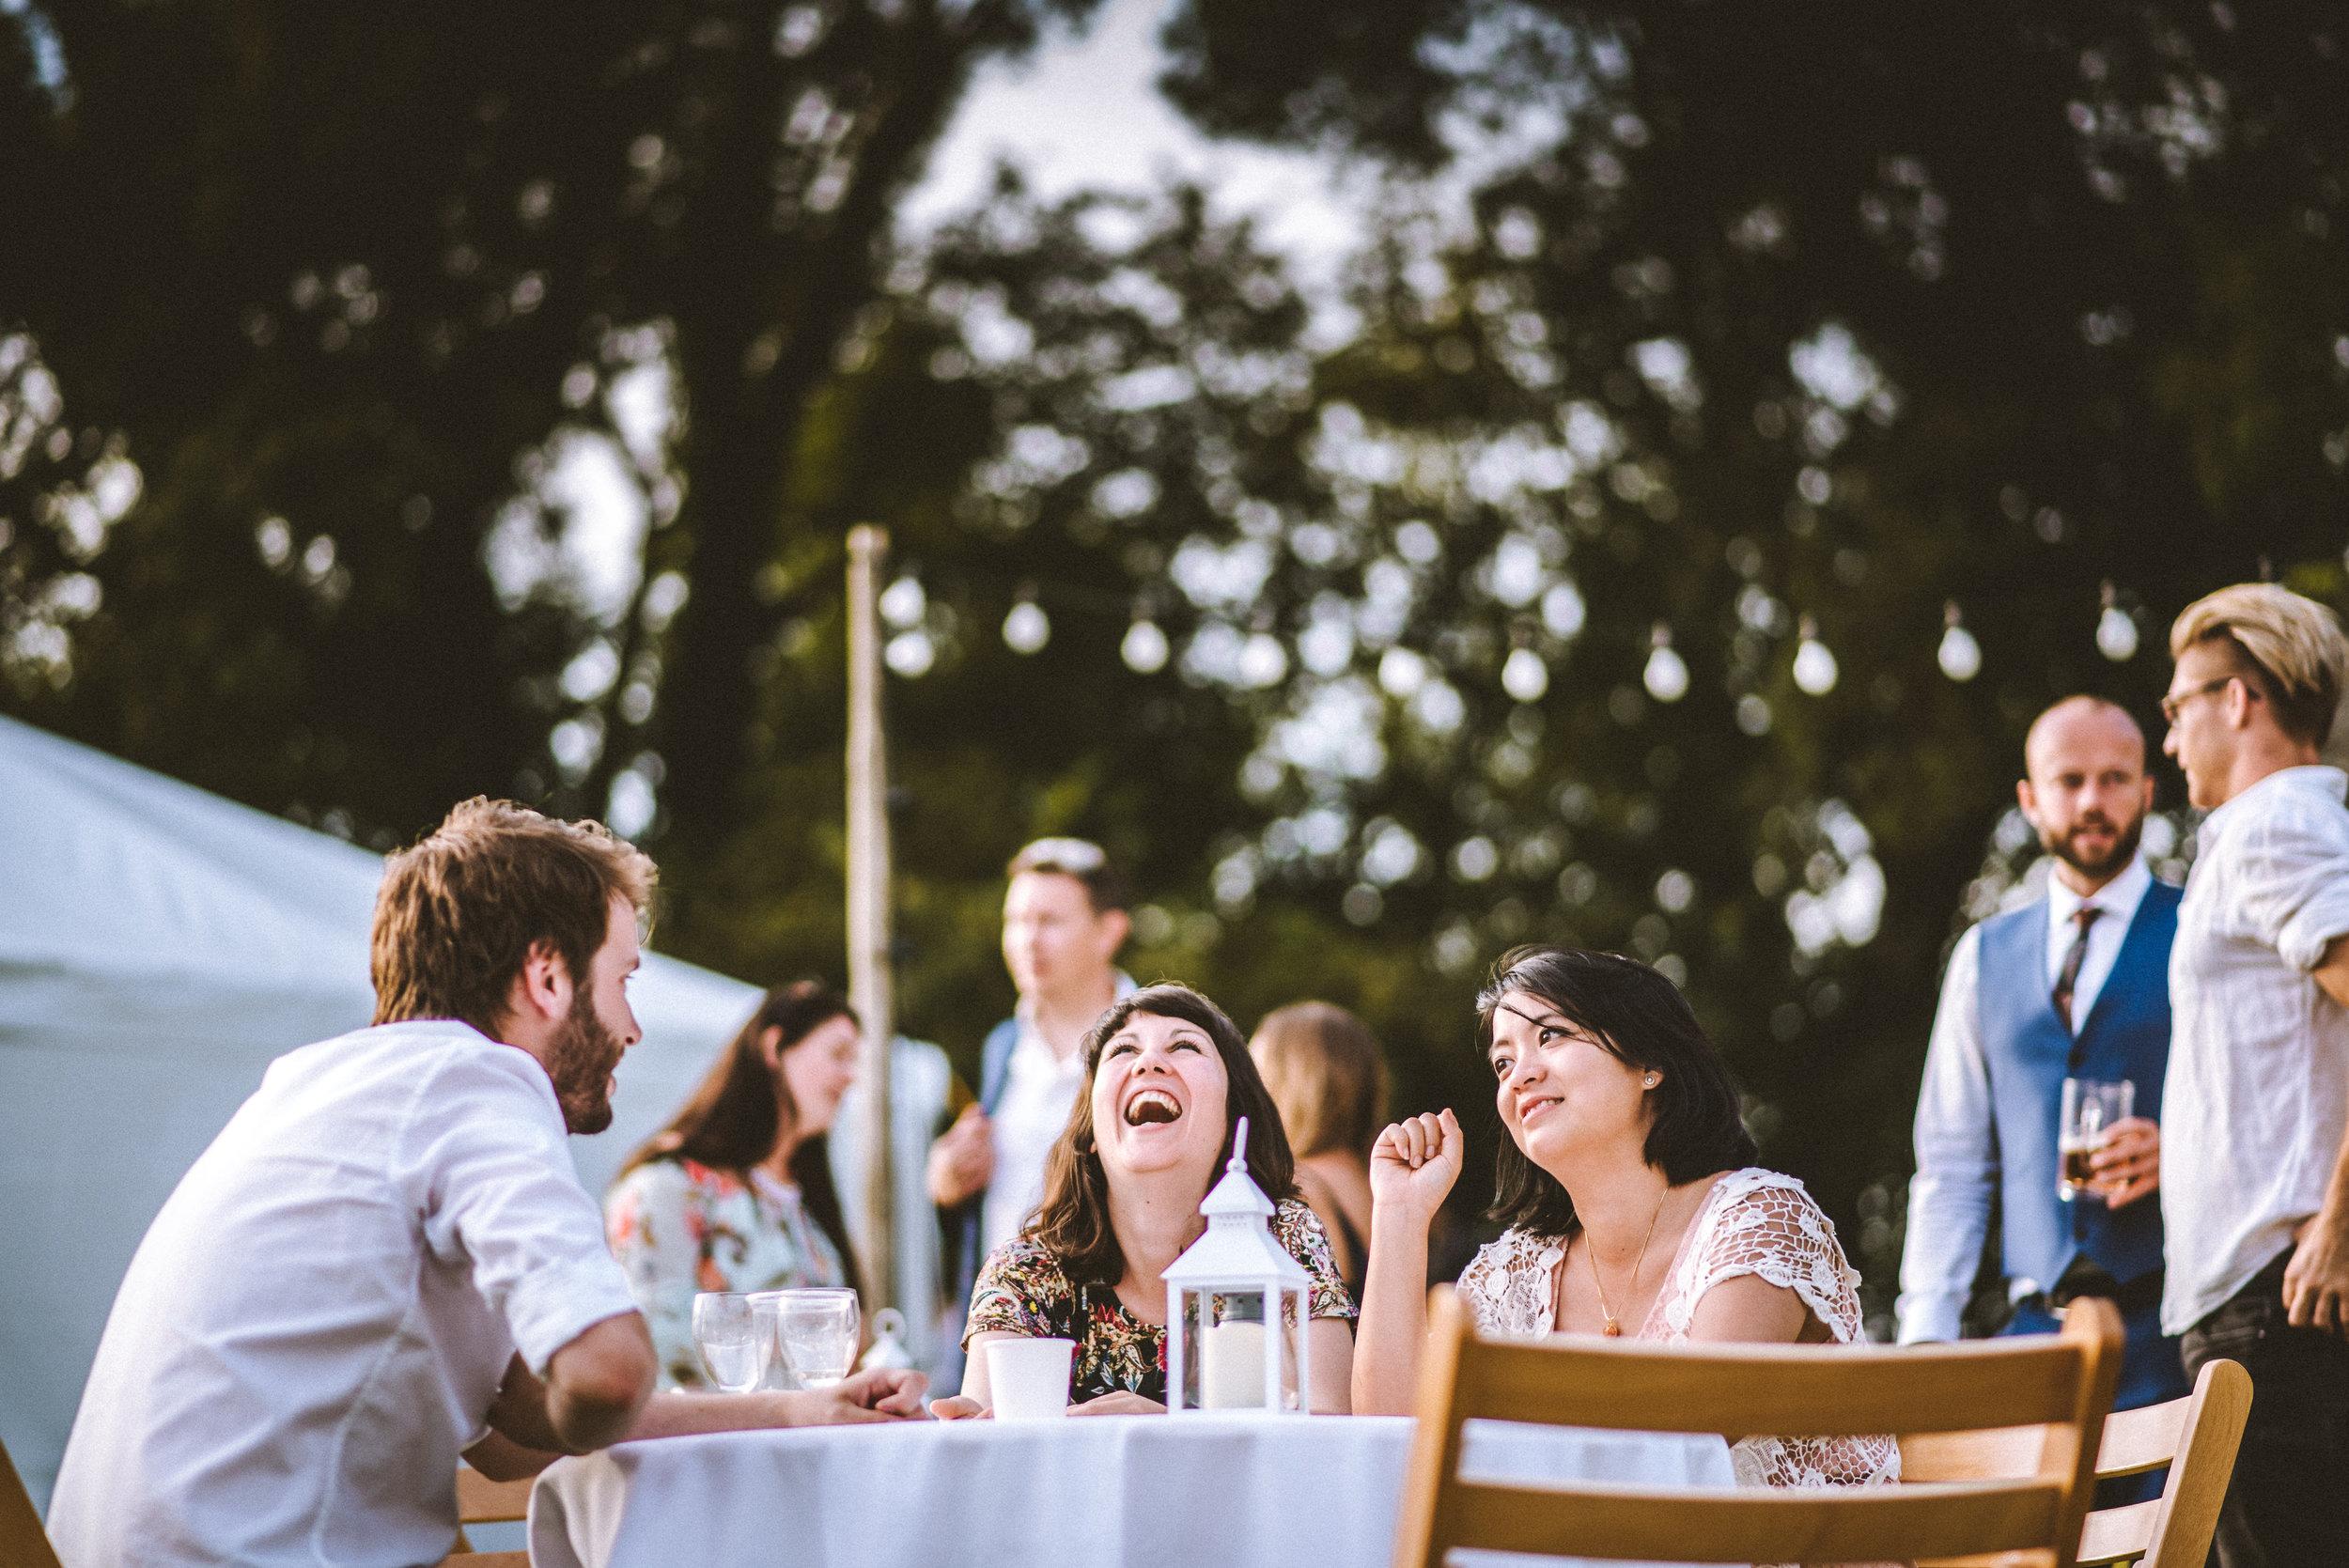 pencarrow-house-wedding-photographer-121.jpg